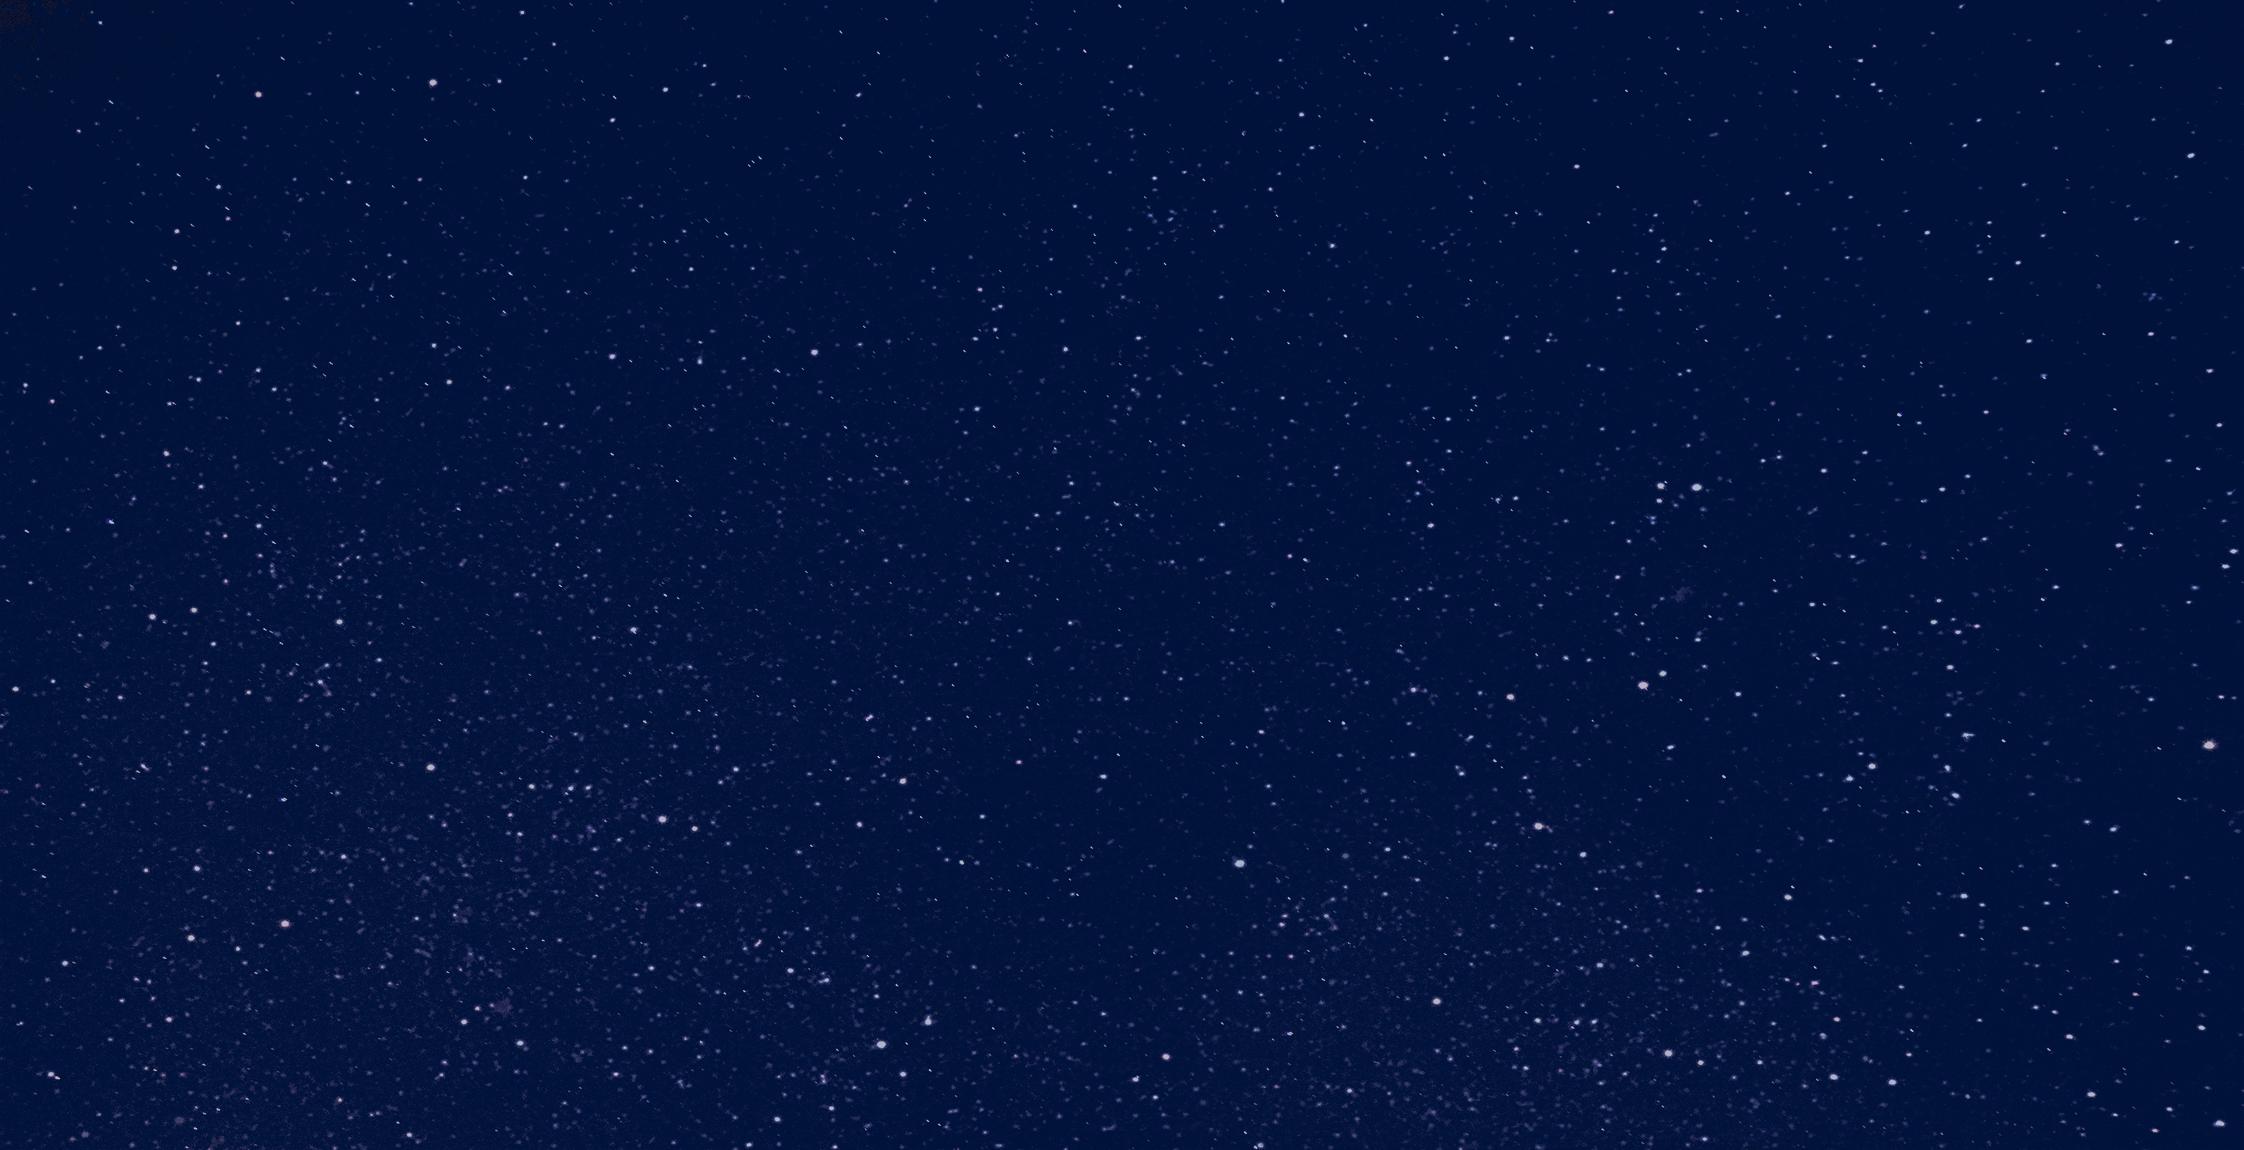 cielo stellato rielab mr 4